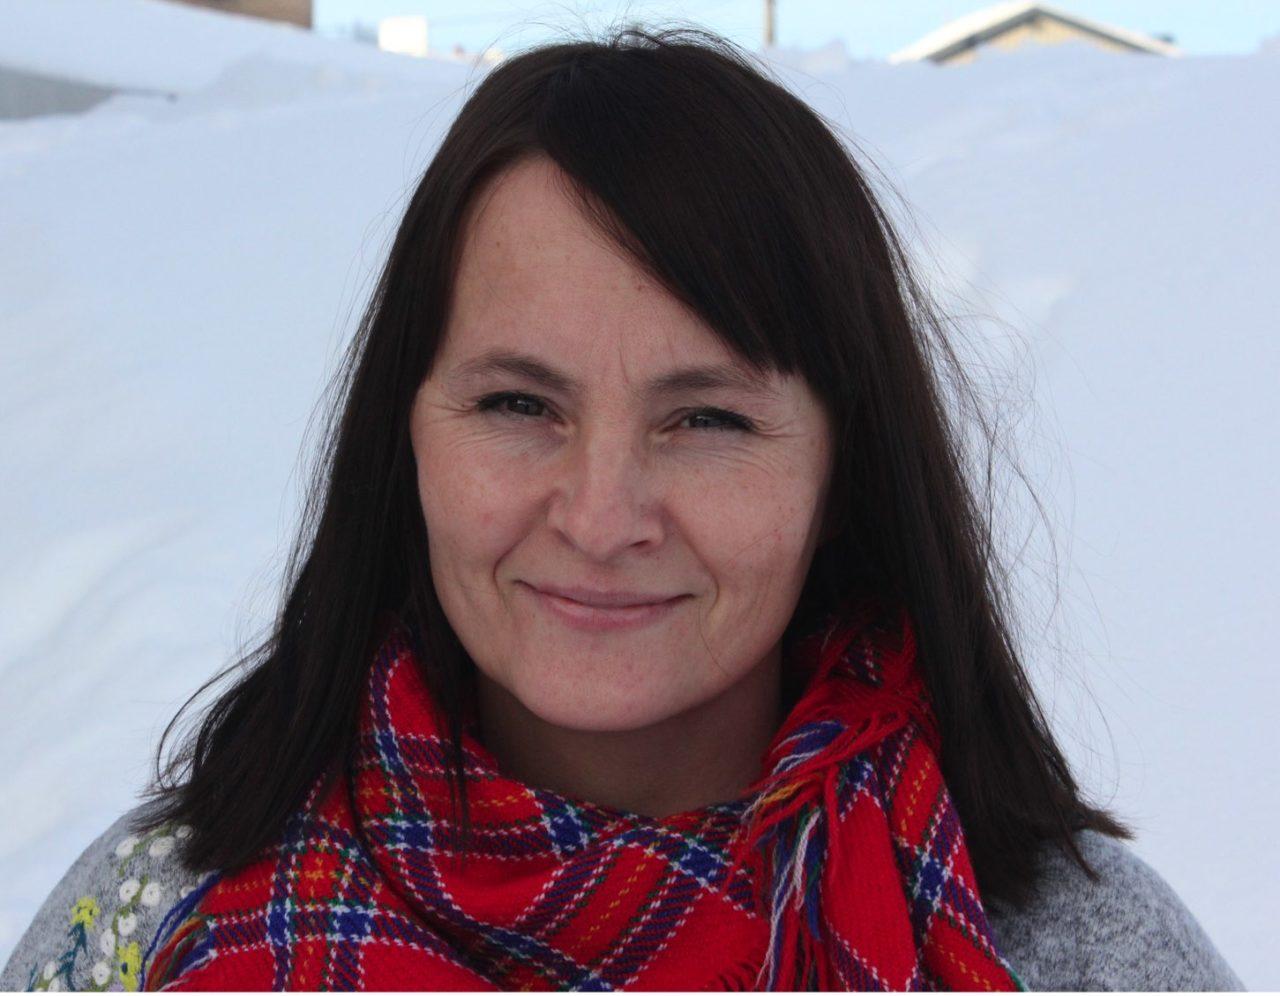 Anne-Lajla-Utsi-1280x996.jpg